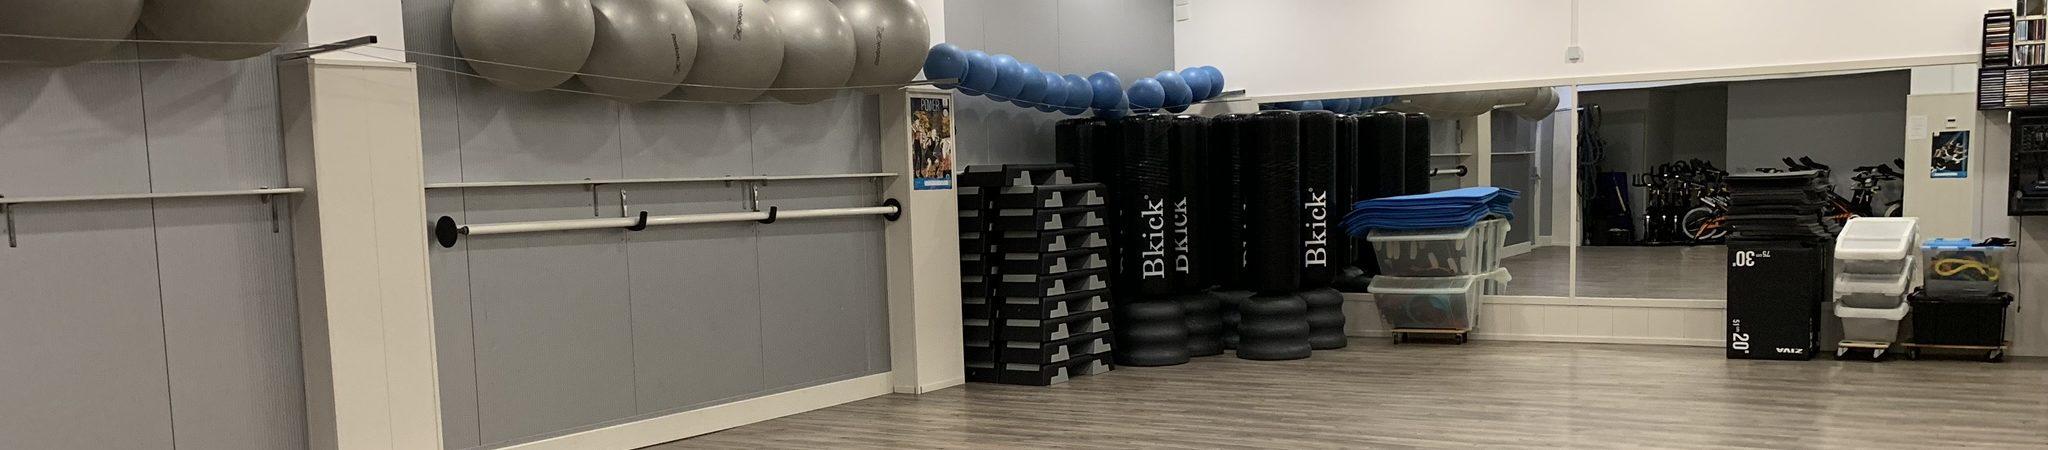 Sportschool Universal Gym - Groepszaal